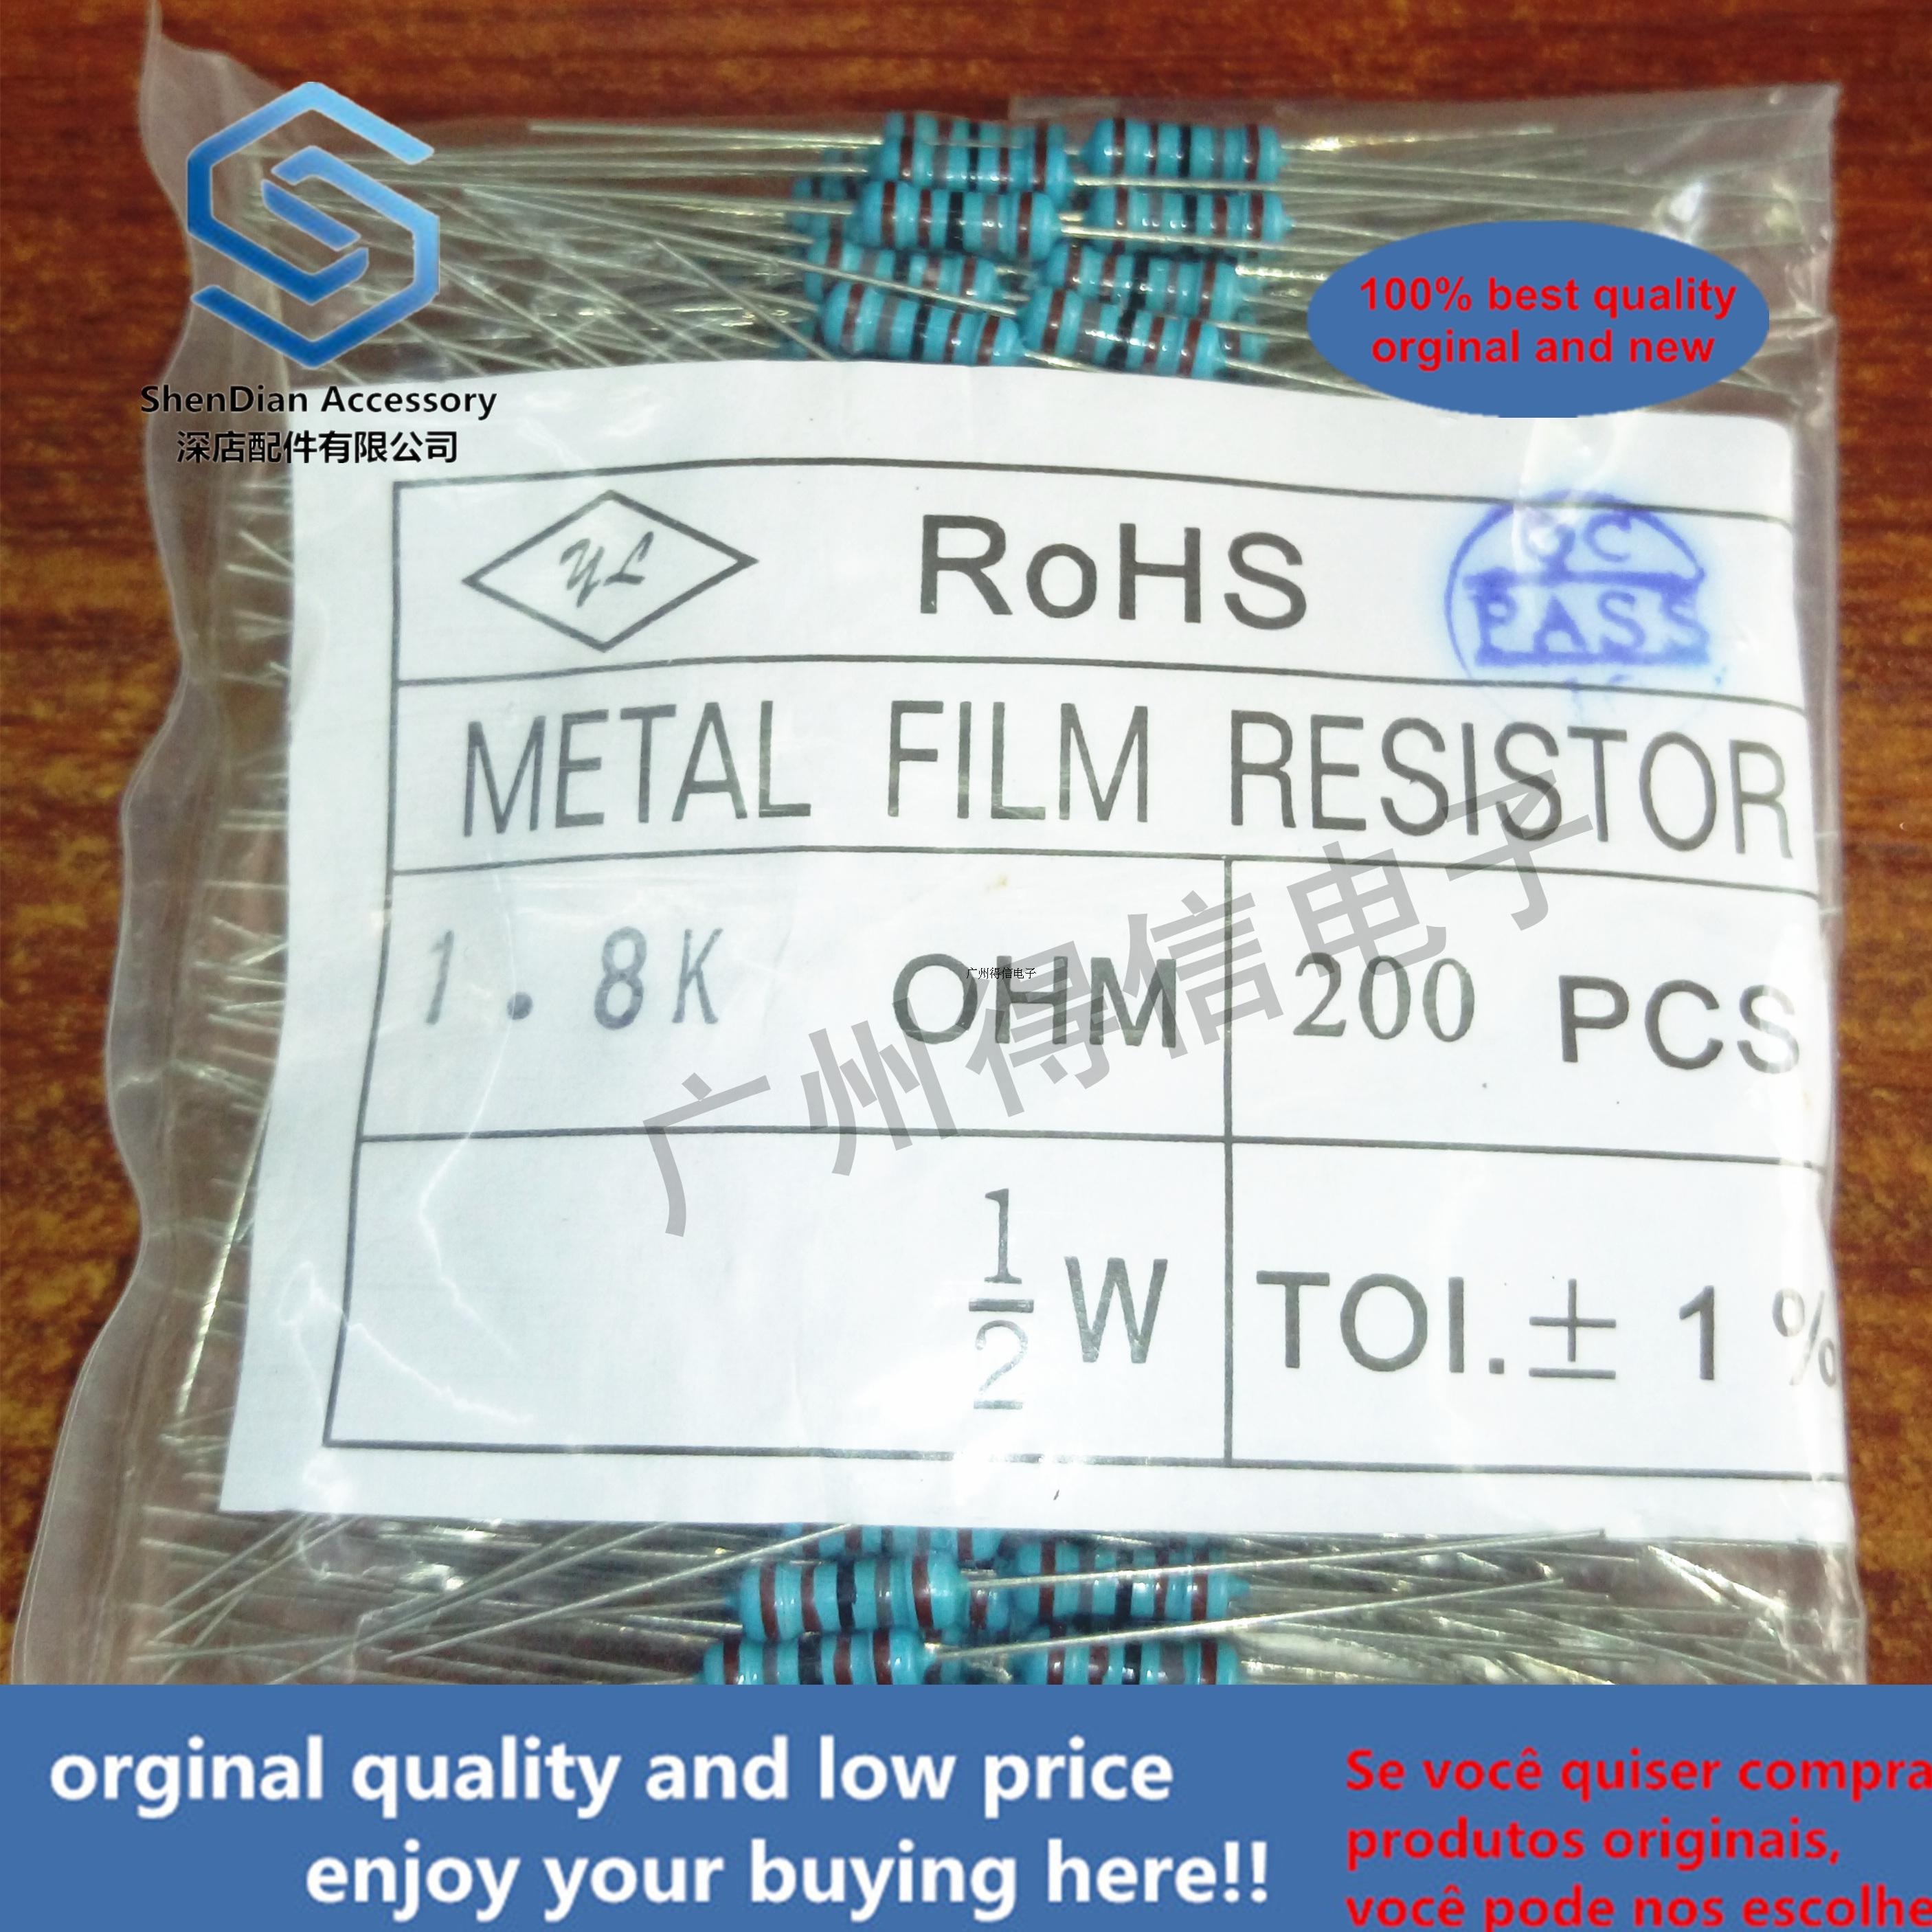 200pcs 1 / 2W 330K 1% Brand New Metal Film Iron Feet Resistor Bag 200 Pcs Per Pack